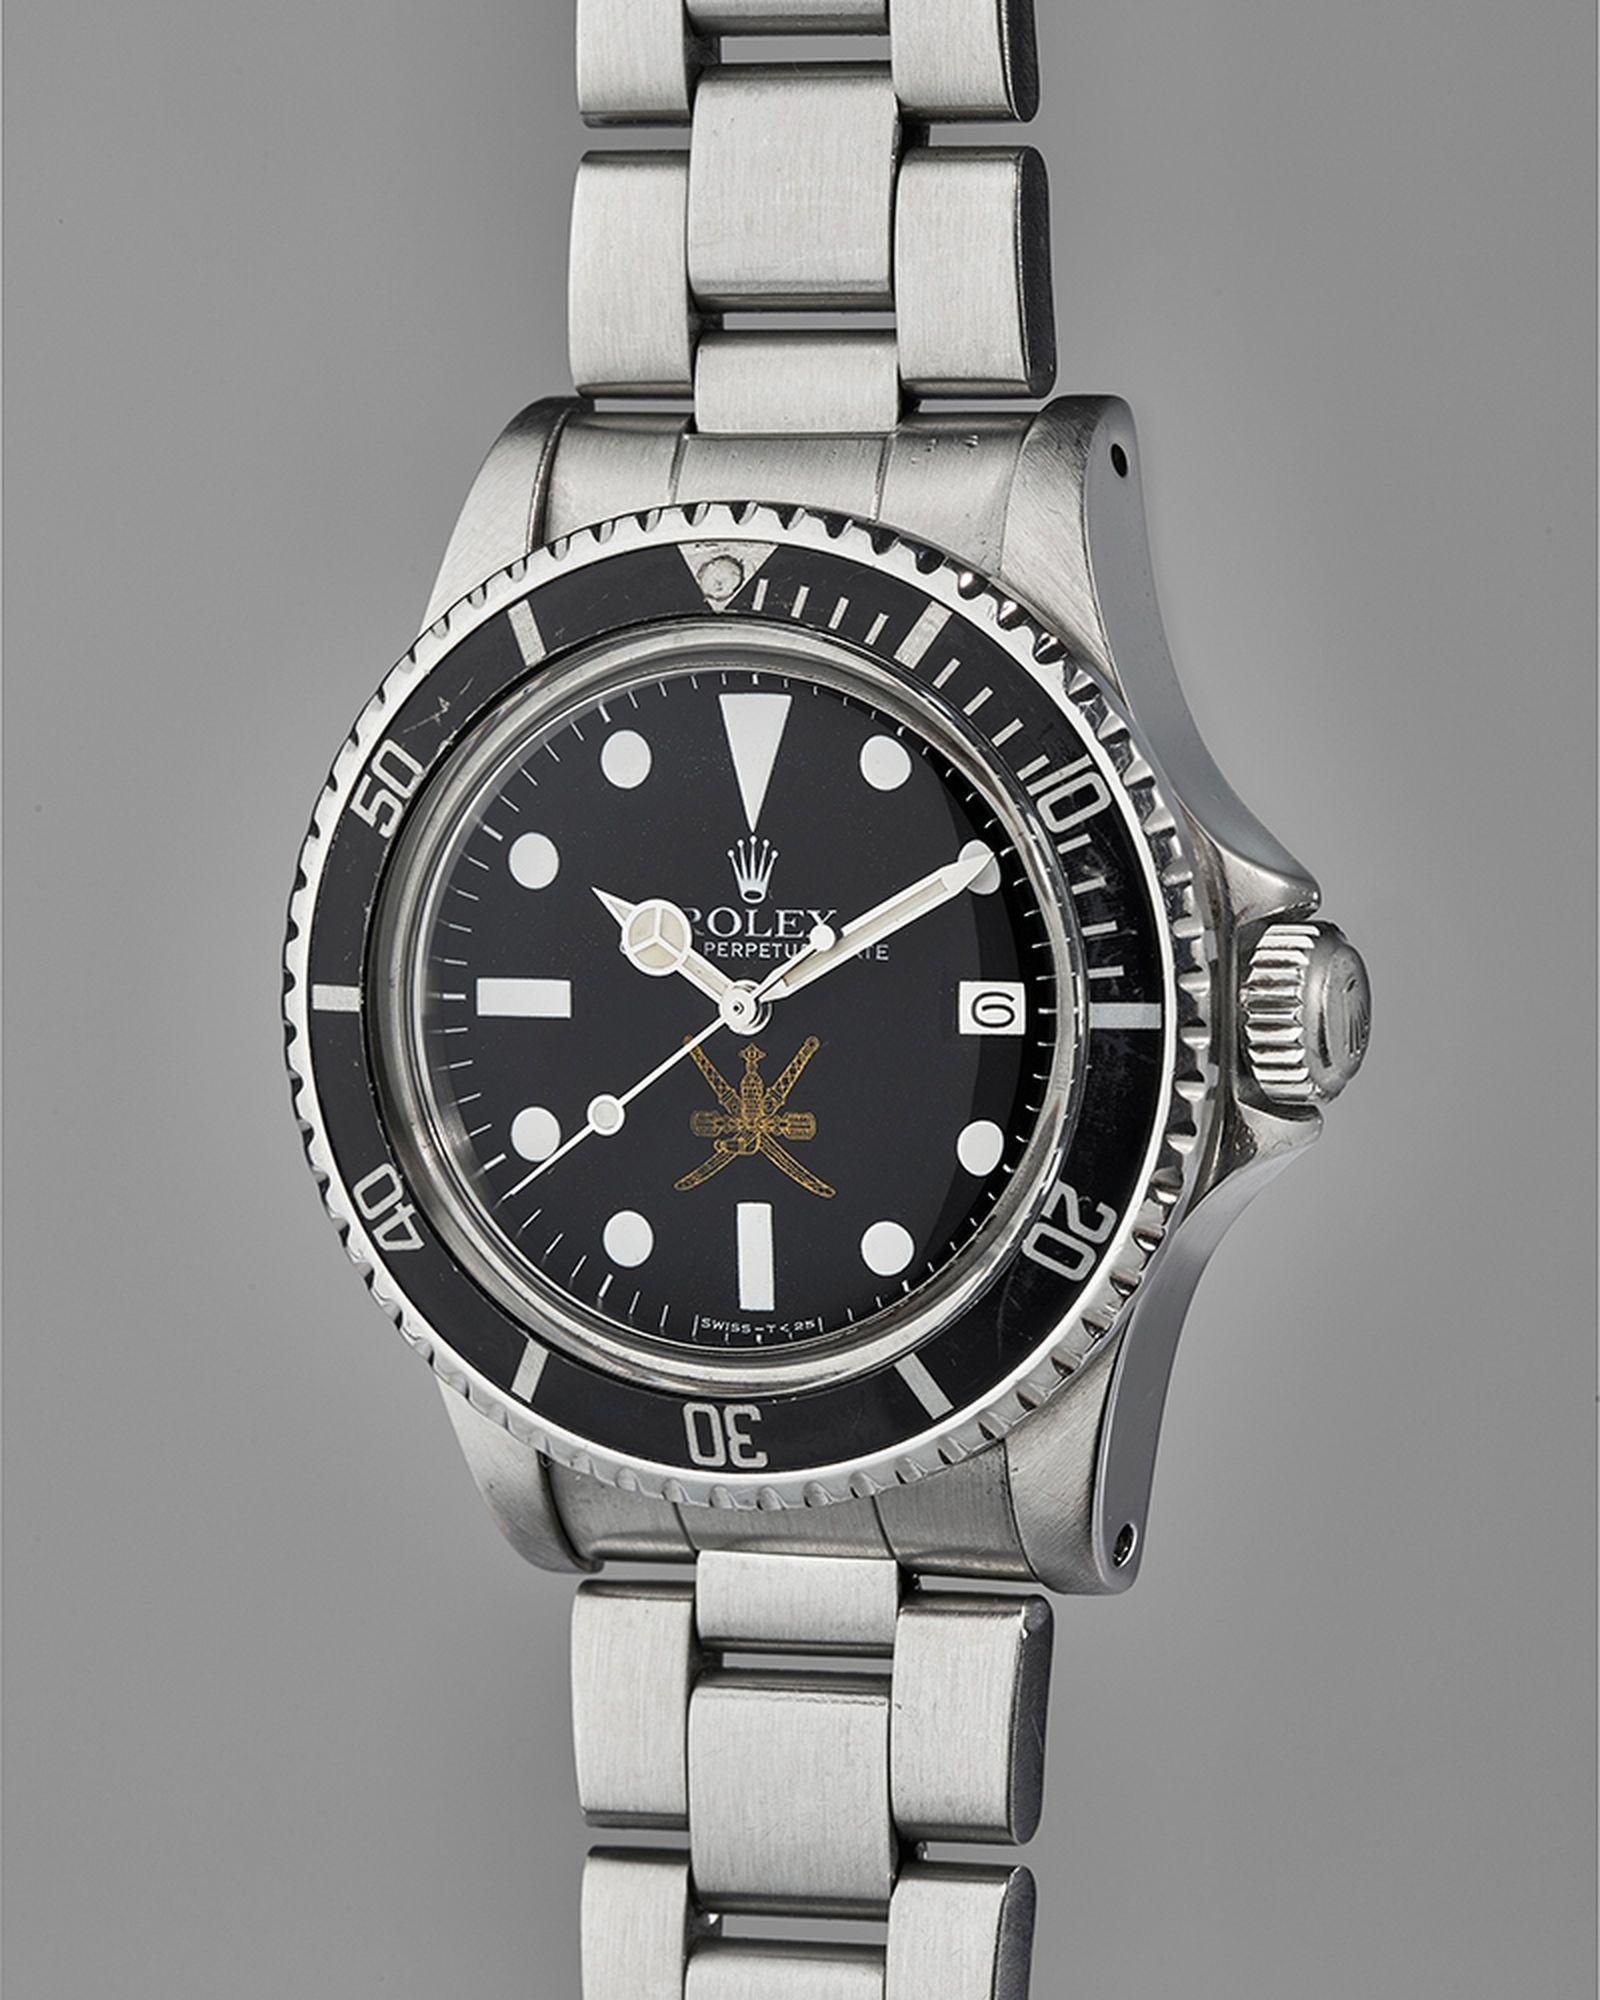 rolex-watches-phillips-auction-06